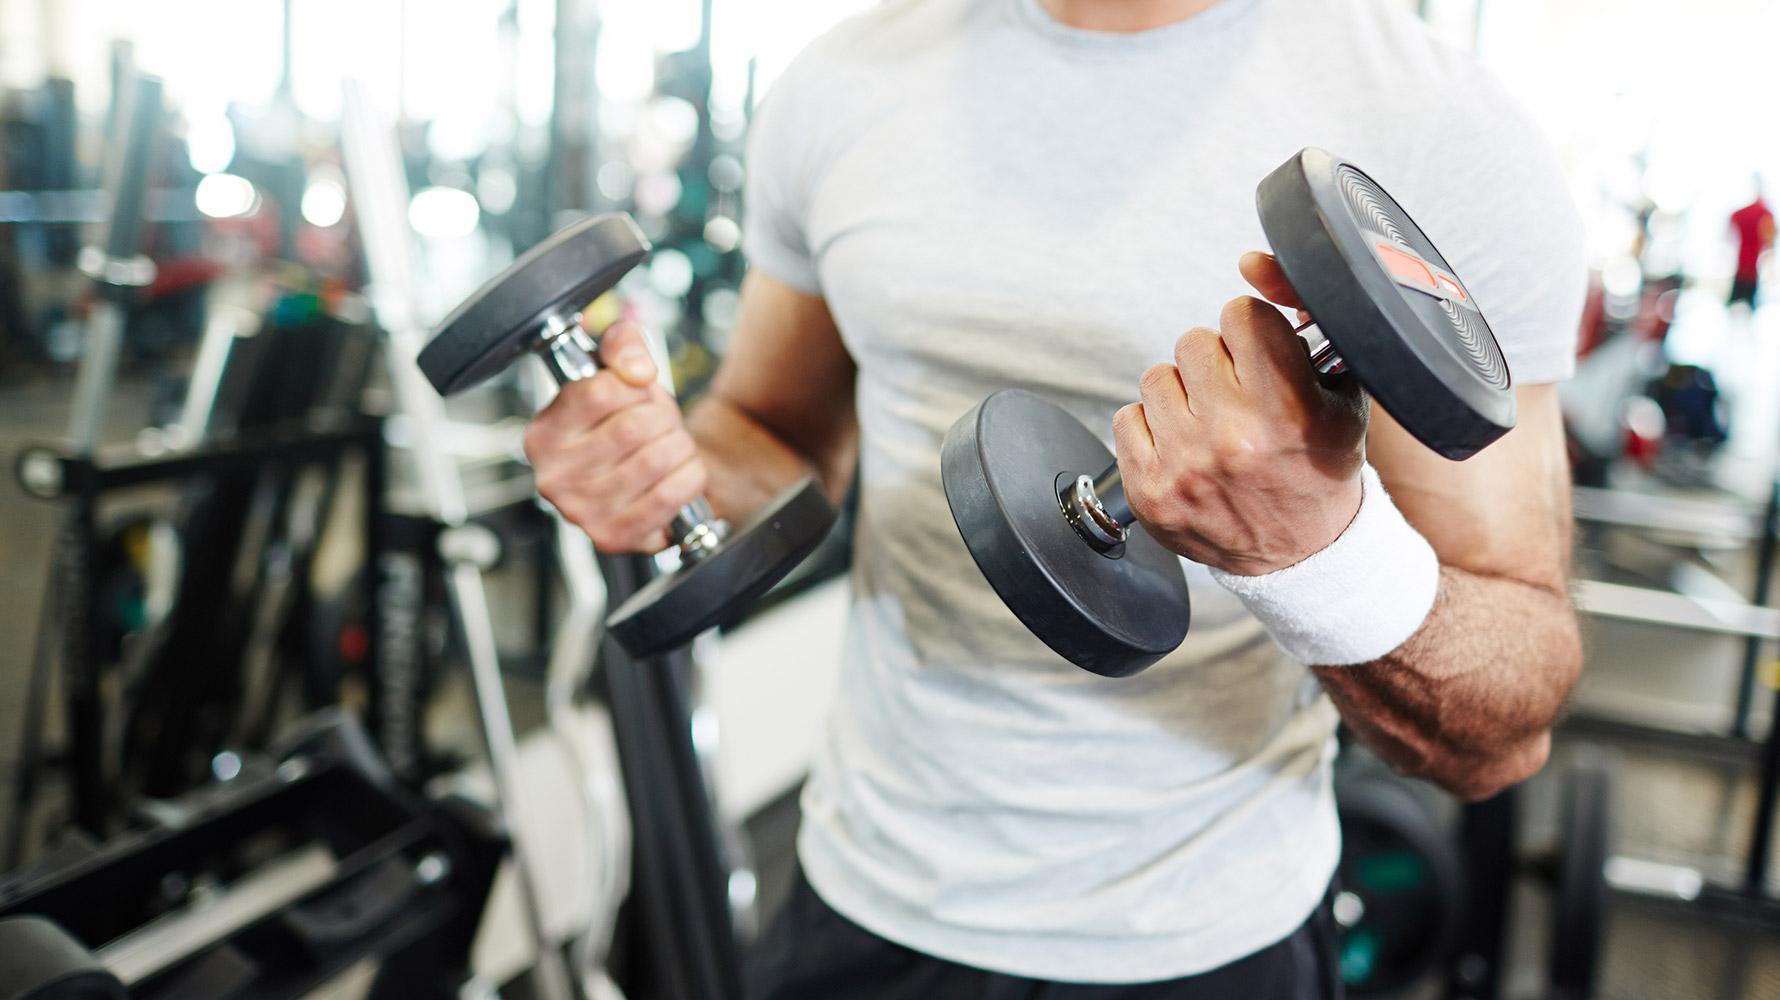 best exercises for inner arm flab